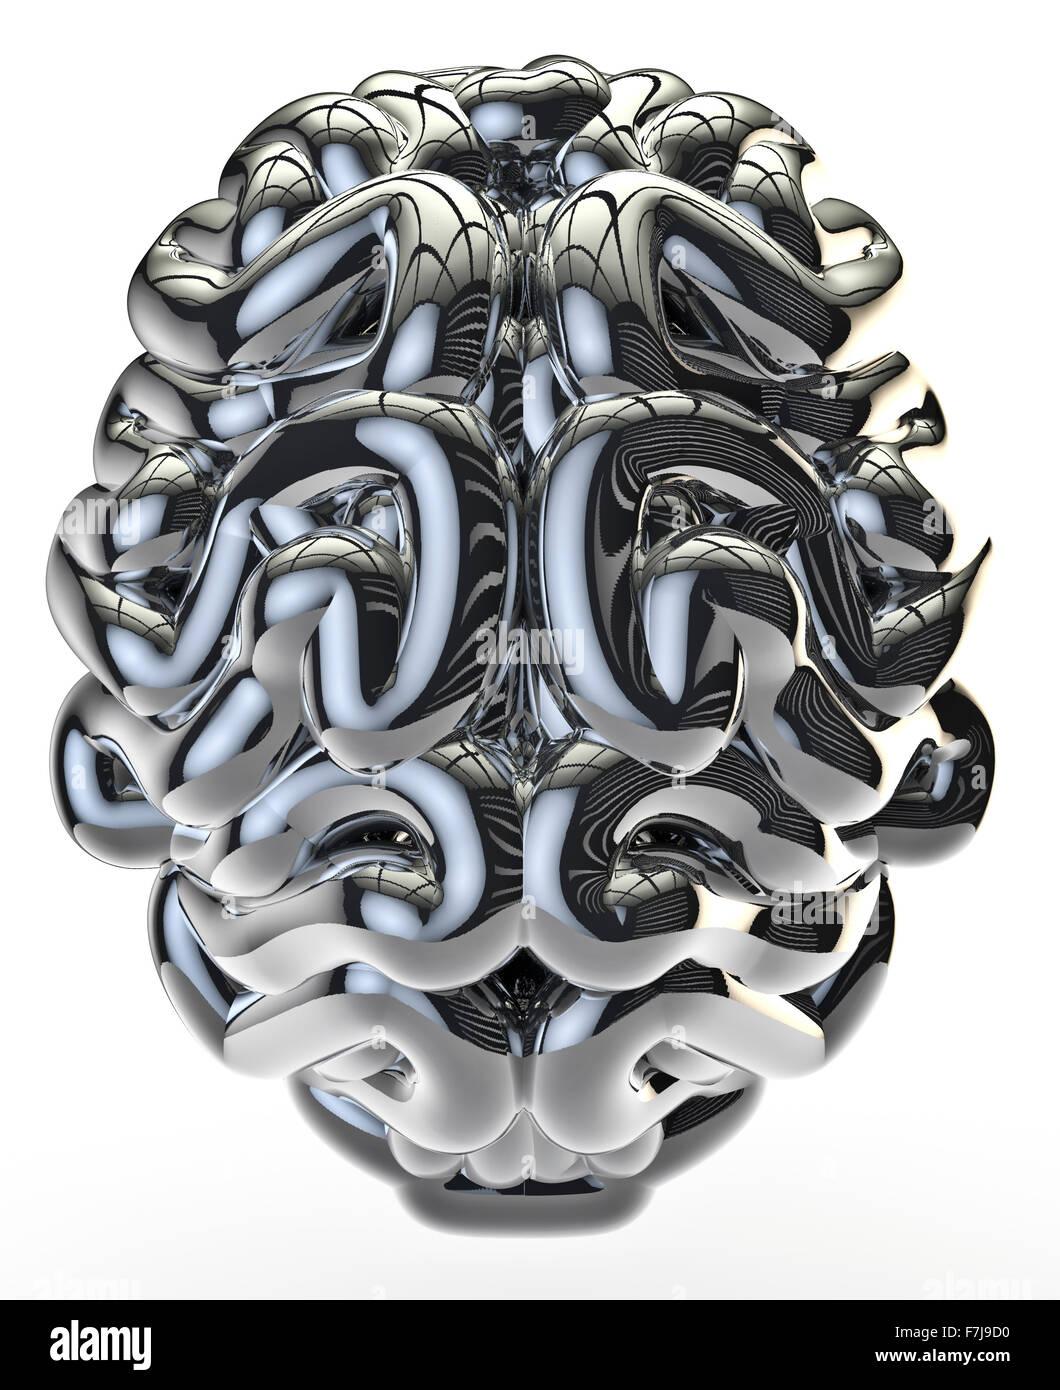 Chrome brain / 3D render of brain isolated on white - Stock Image